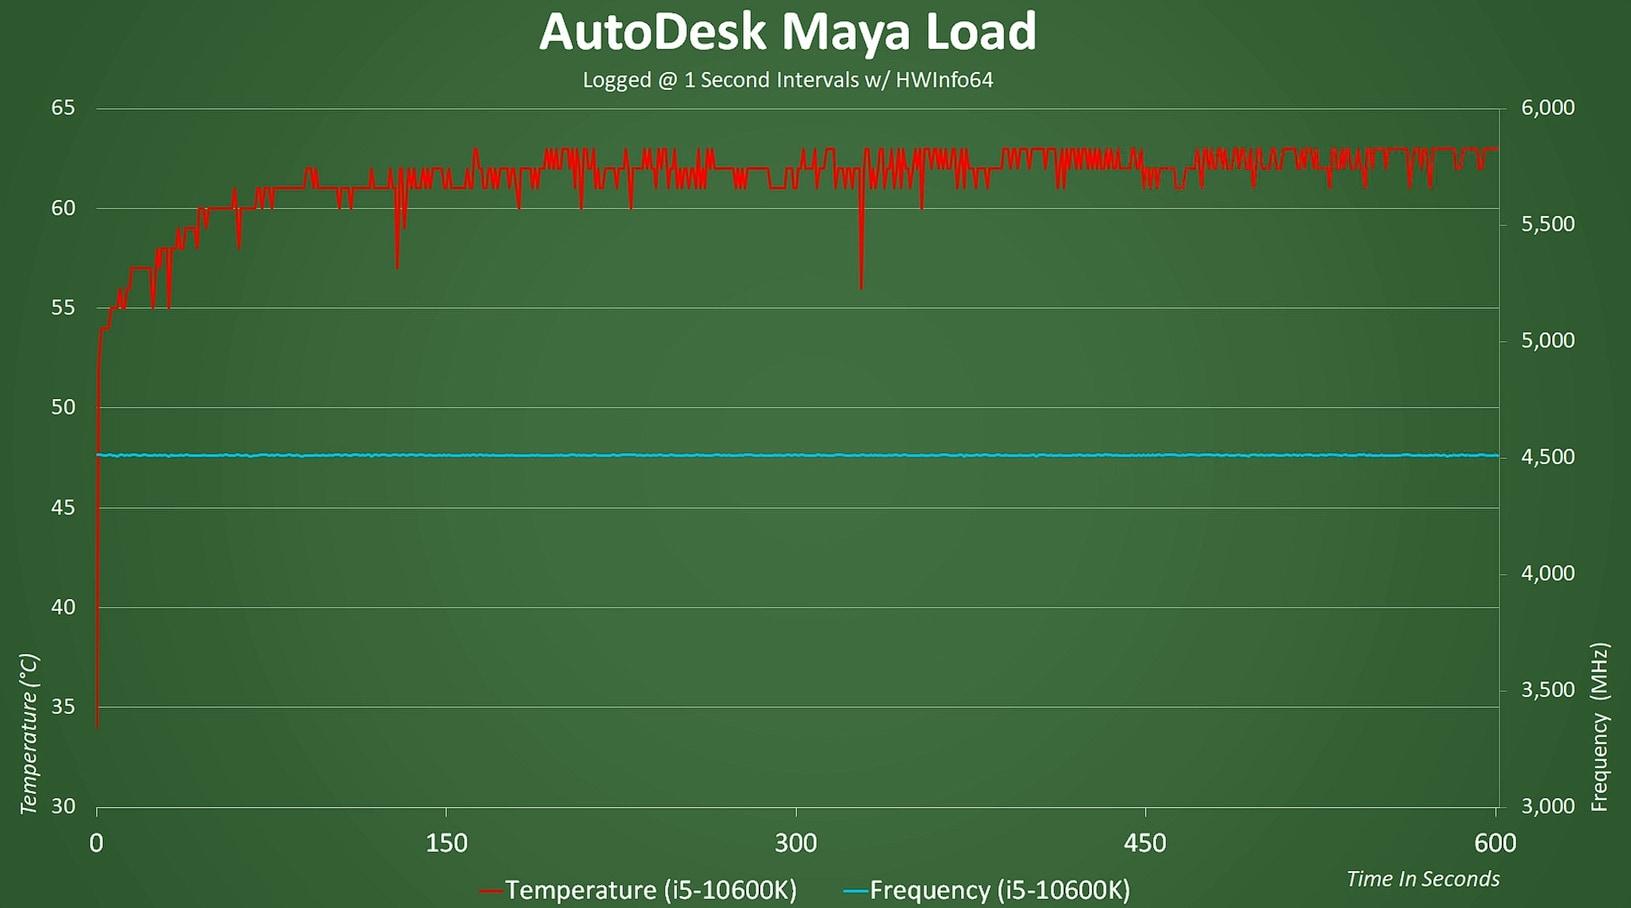 AutoDesk Maya Load - 2